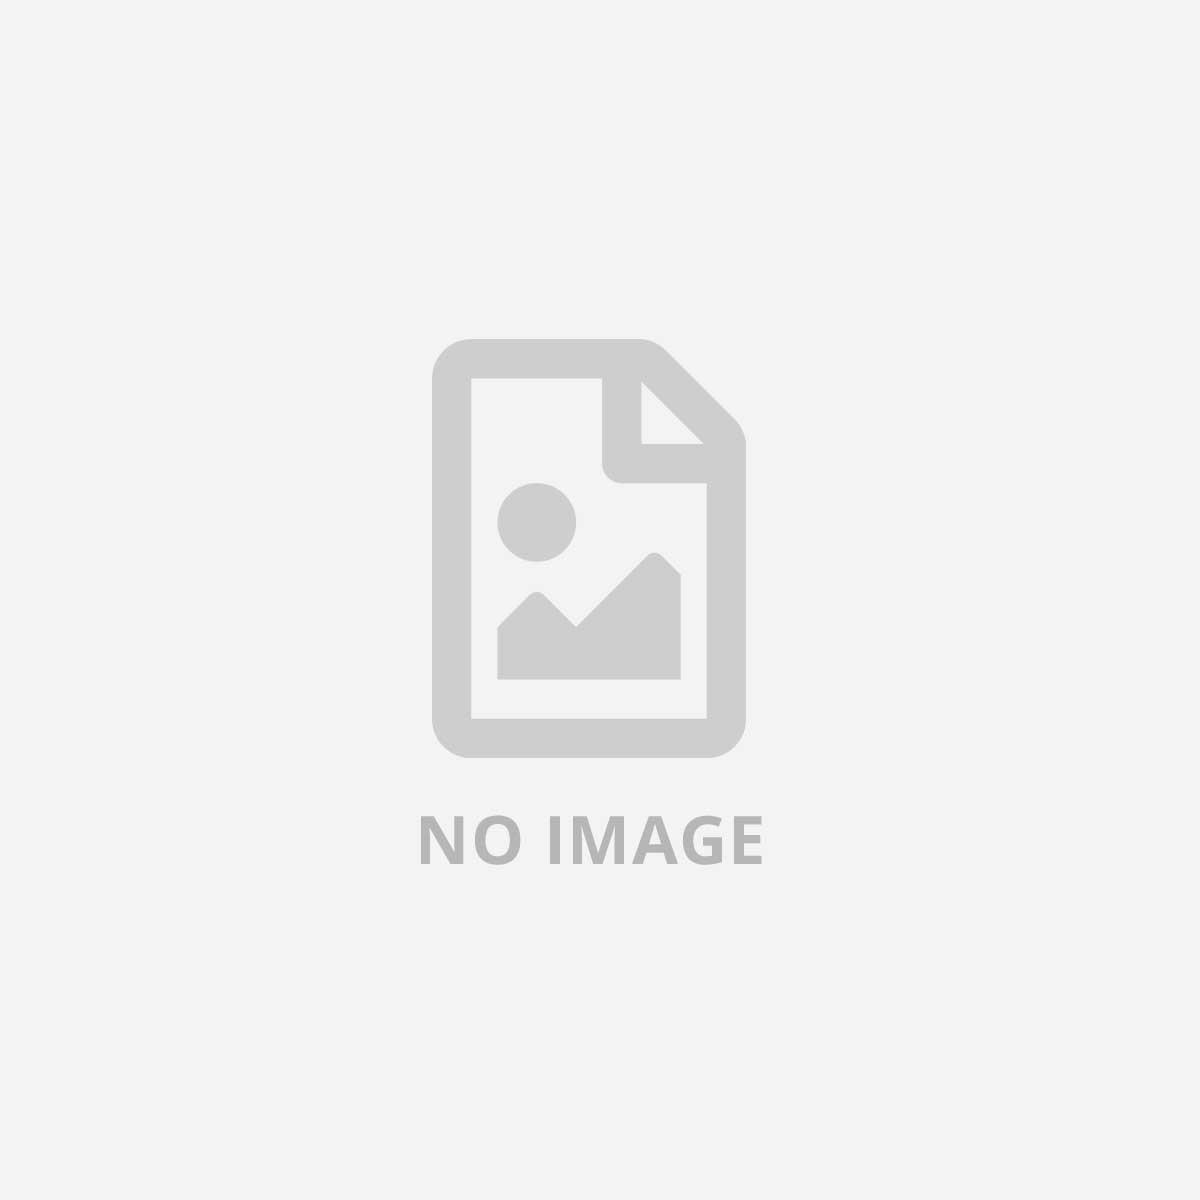 STRONG C200 32 HD READY DVB-T2/S2